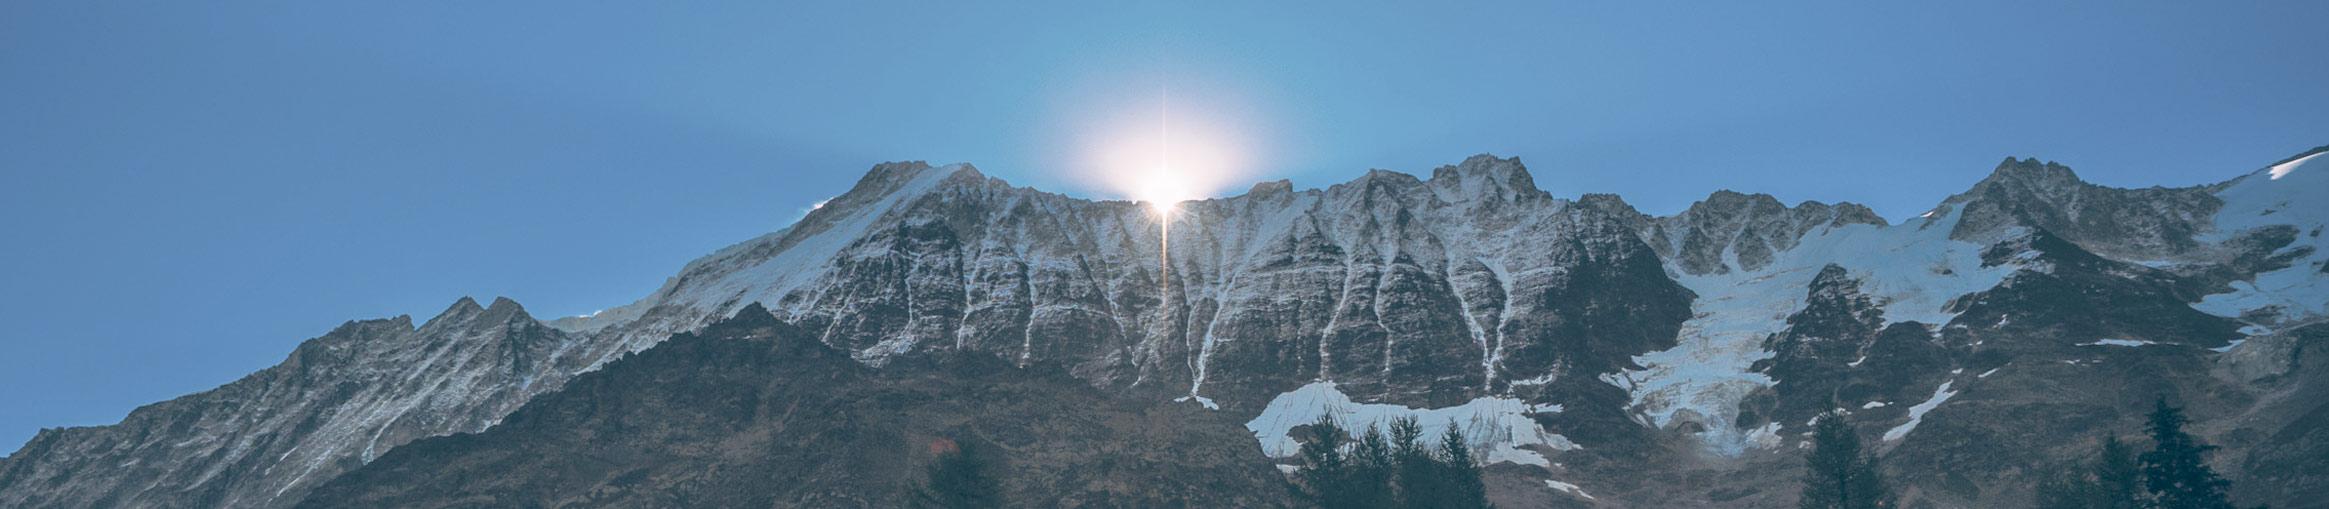 nandi_header_mountain_2